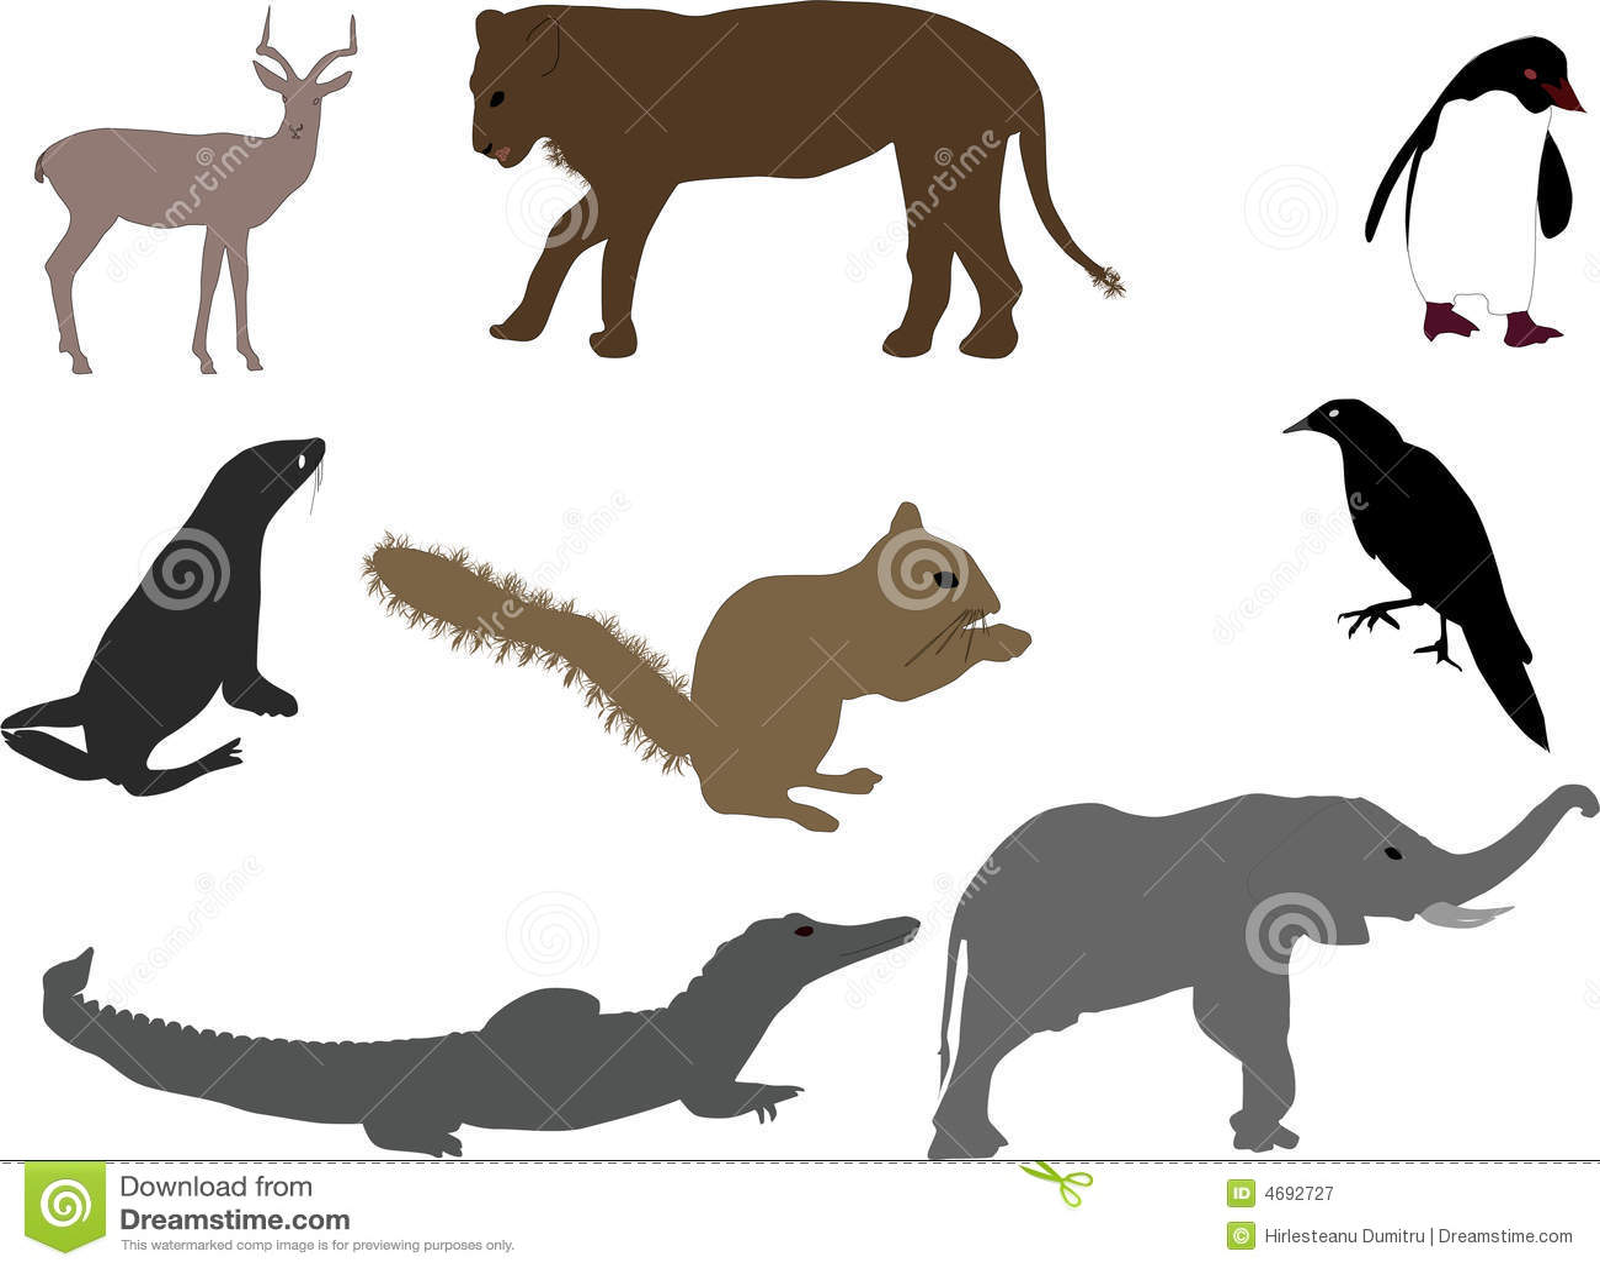 Animal Shapes Royalty Free Stock Photography